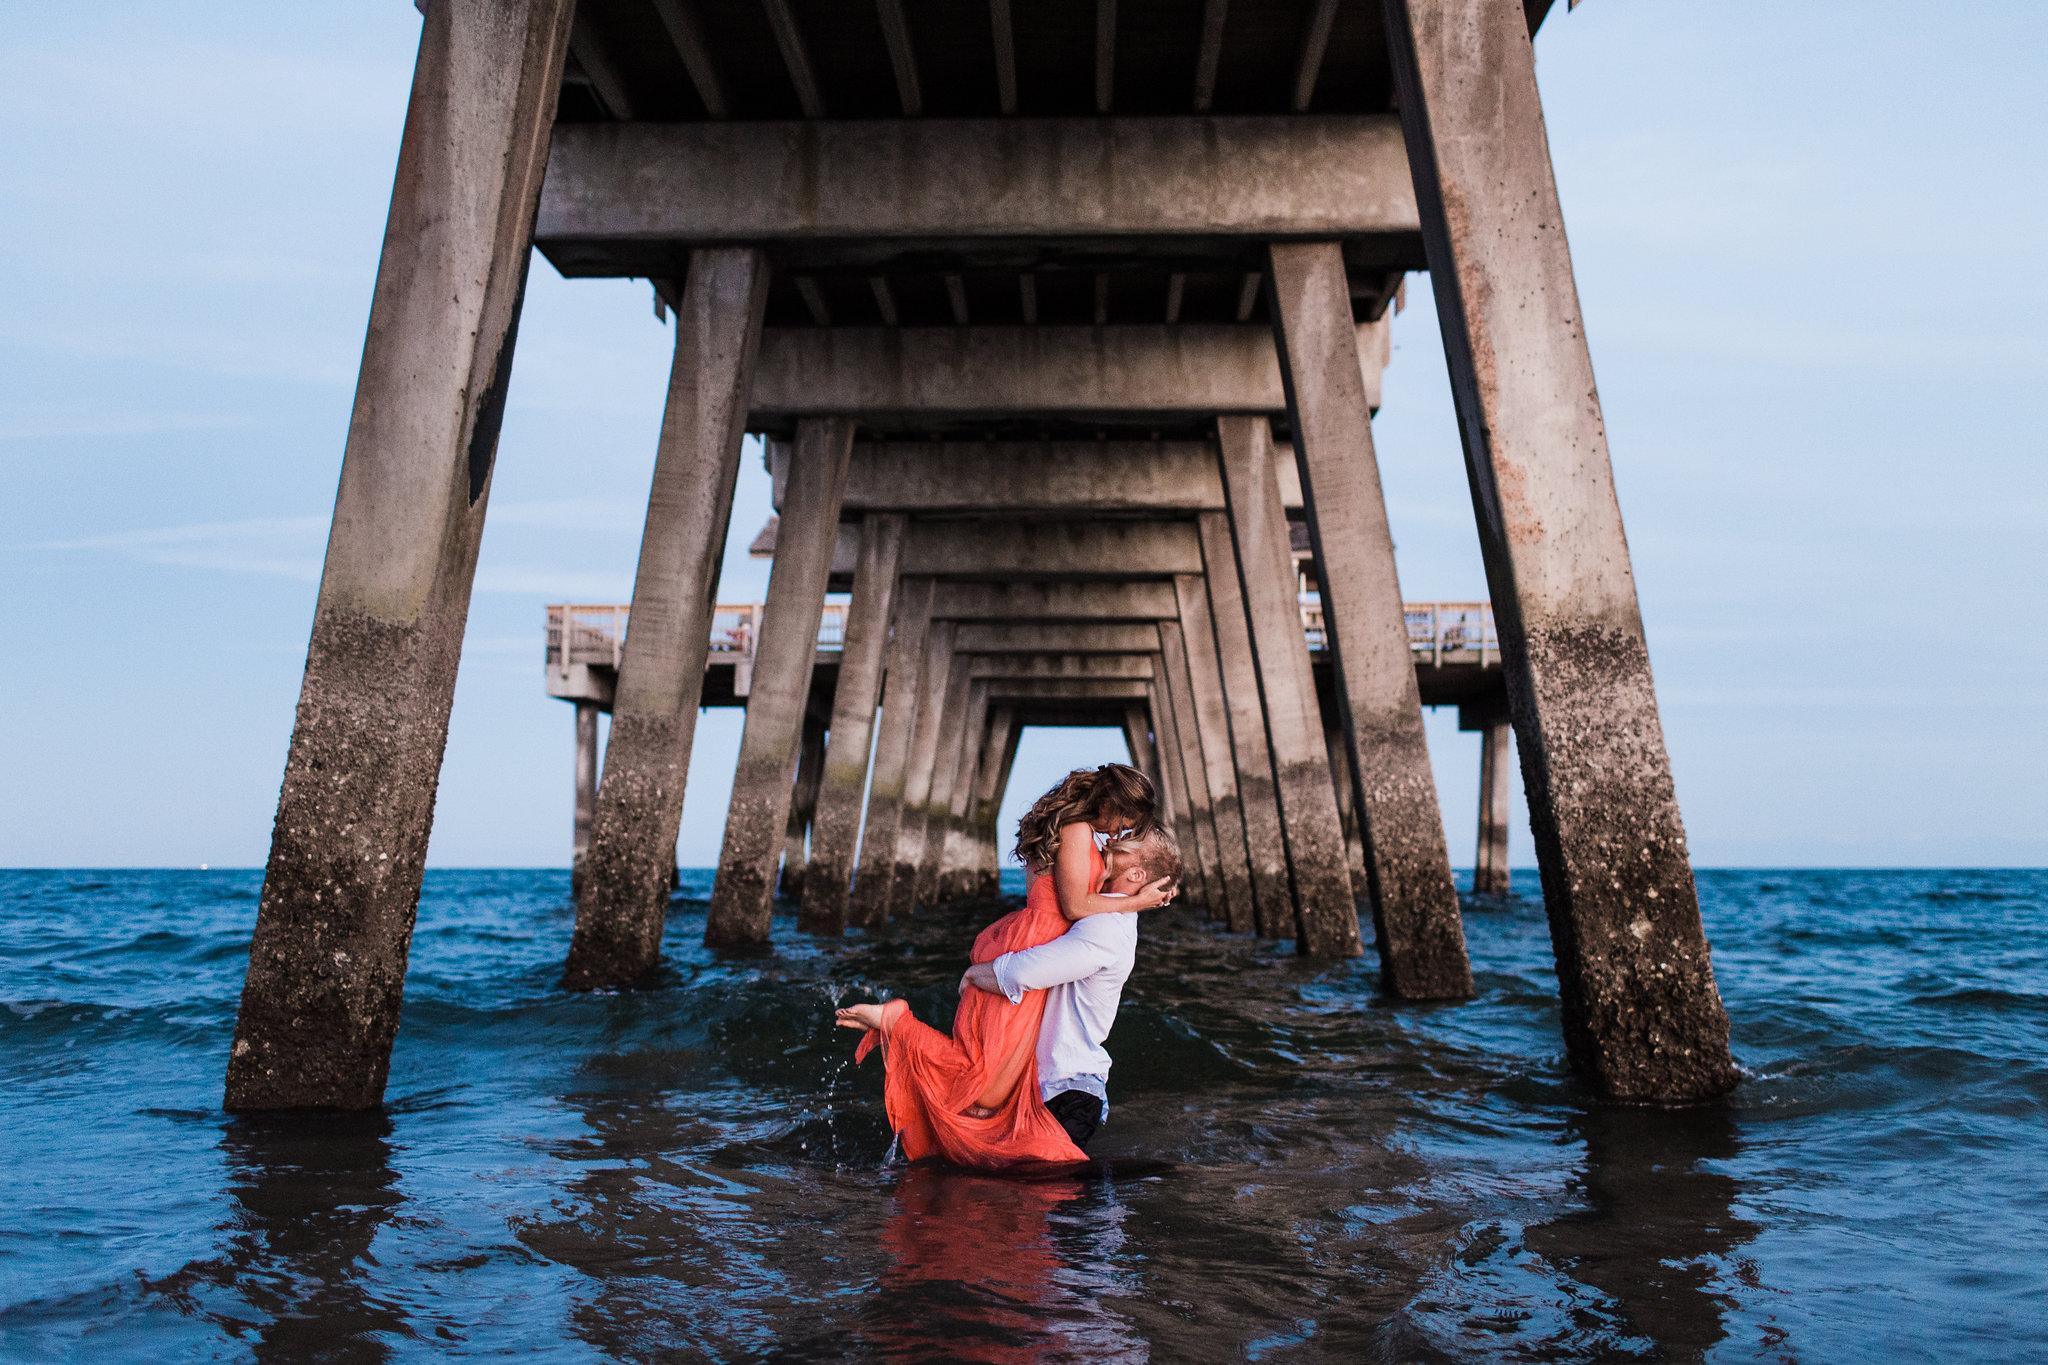 Erin-kevin-apt-b-photography-tybee-island-engagement-photoshoot-savannah-engagement-savannah-wedding-savannah-wedding-photographer-tybee-island-wedding-beach-engagement-tybee-island-sunset-24.jpg